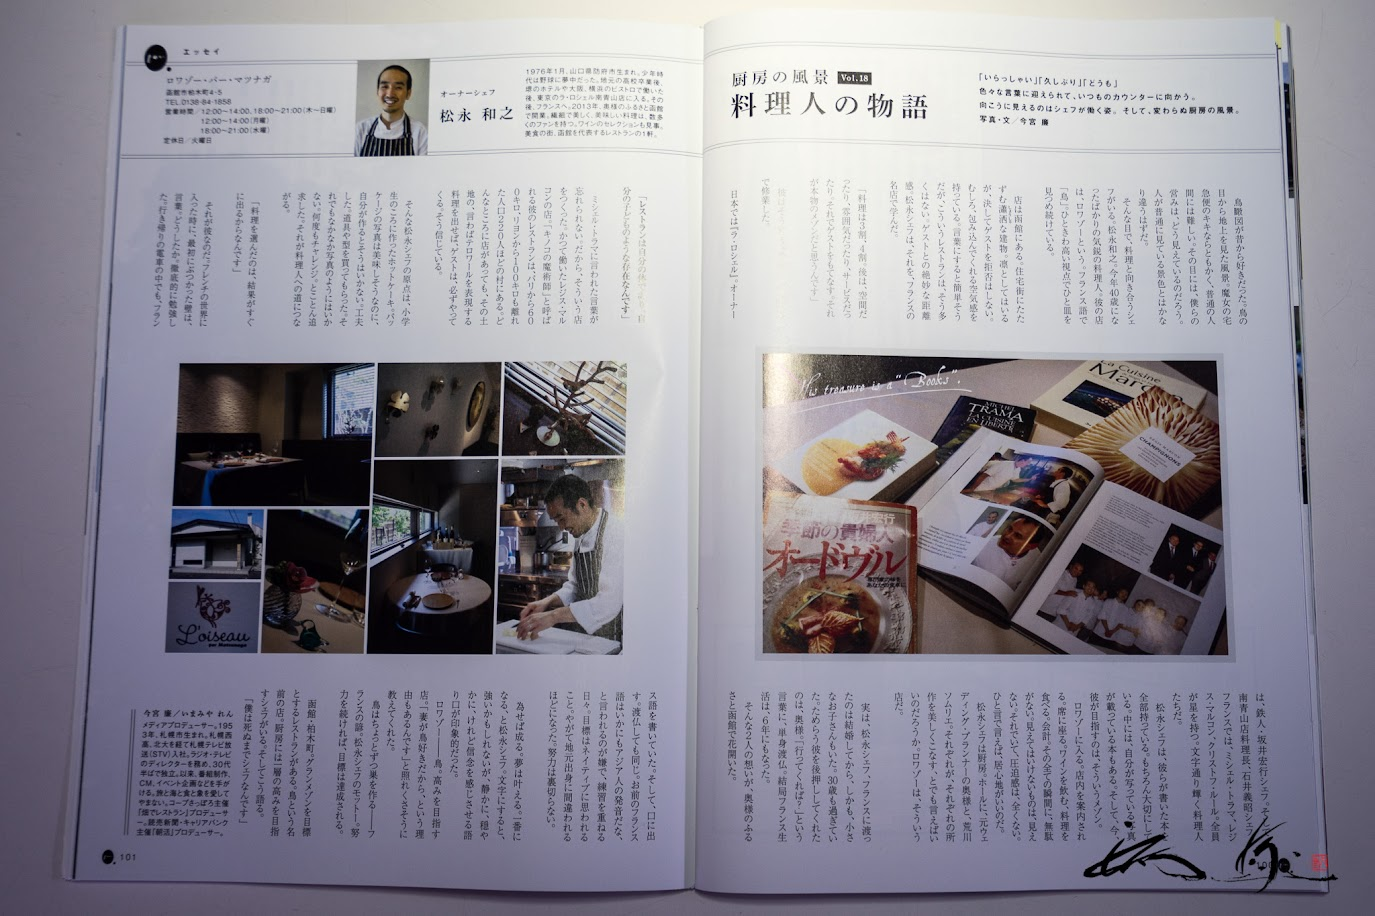 『O.tone(オトン)』Vol.95・「厨房の風景Vol.18 料理人の物語」ロワゾー・パー・マツナガ・オーナーシェフ・松永和之さん